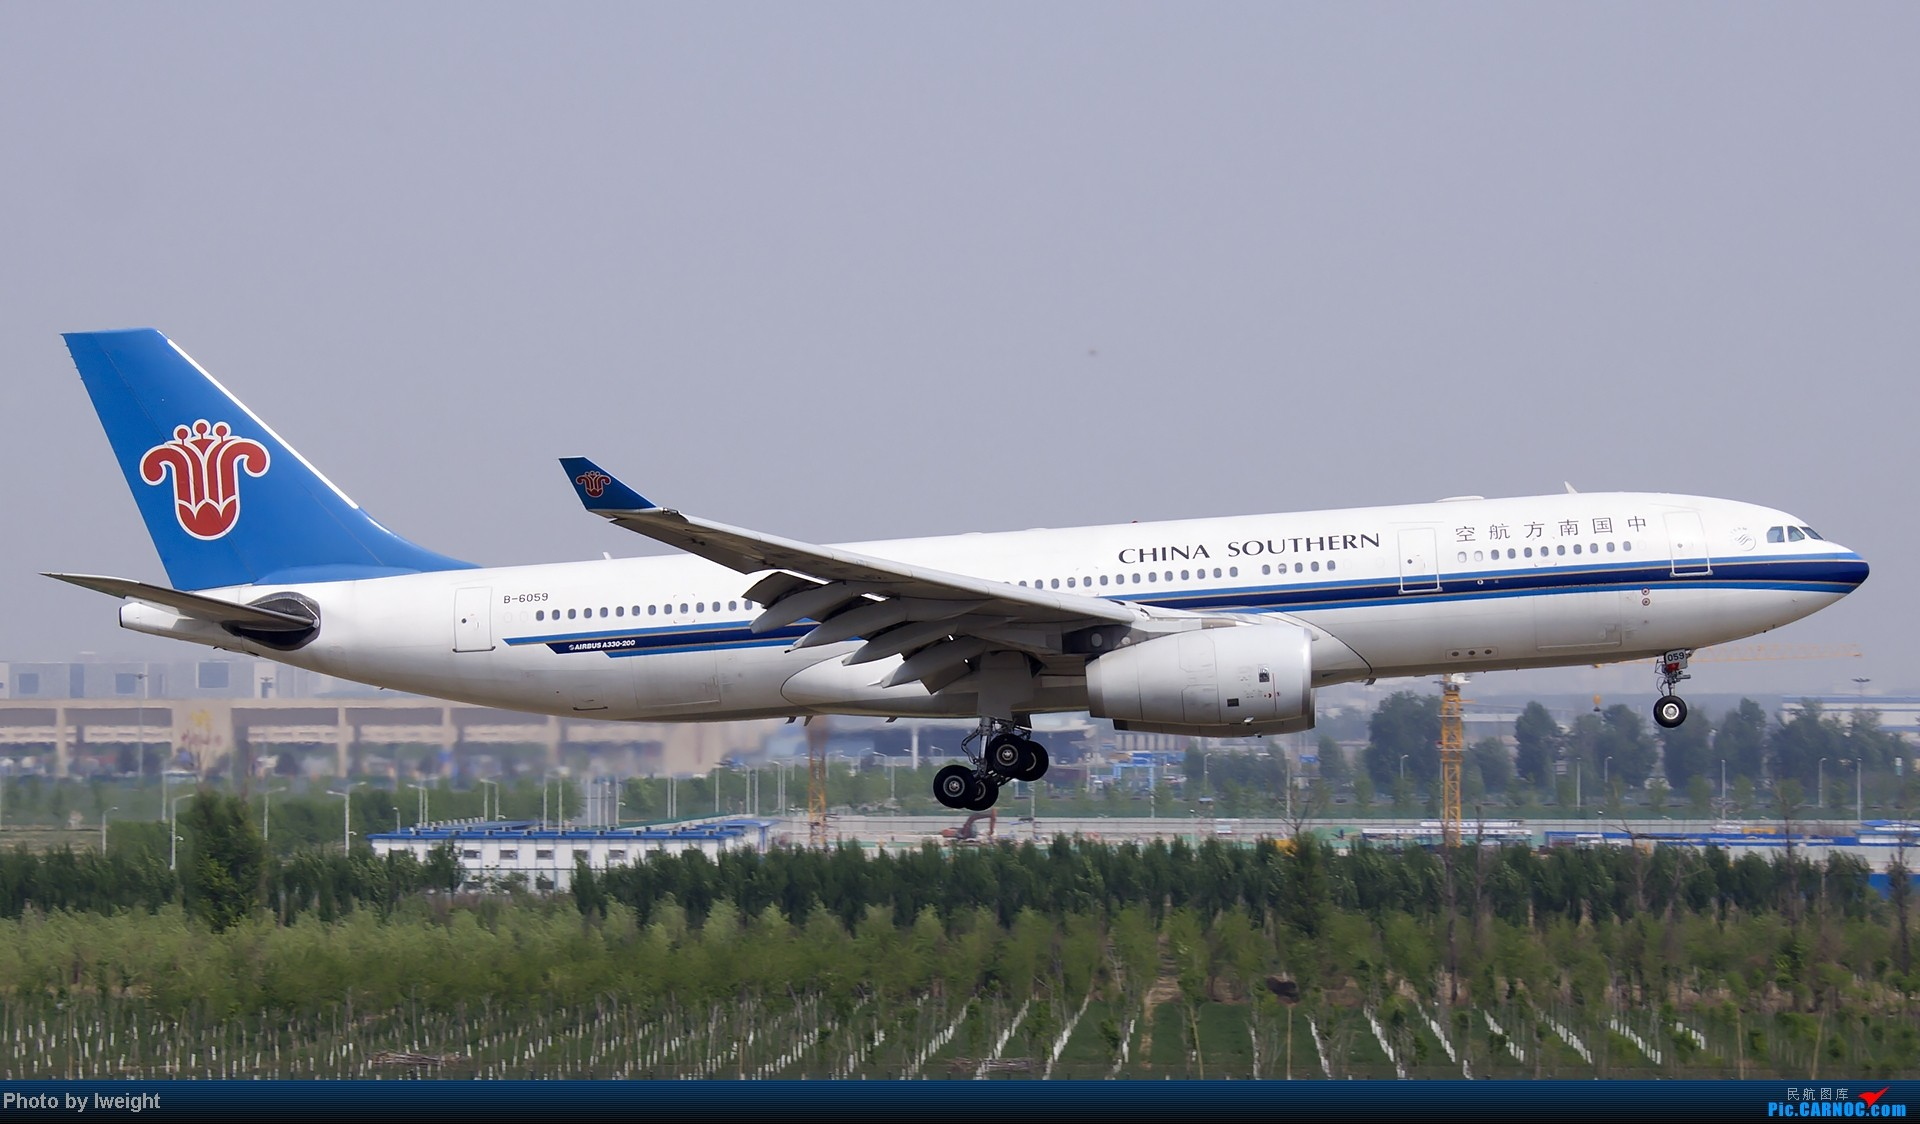 Re:[原创]错过了卡航的巴塞罗那号,只有这些大路货了,泪奔啊 AIRBUS A330-200 B-6059 中国北京首都机场